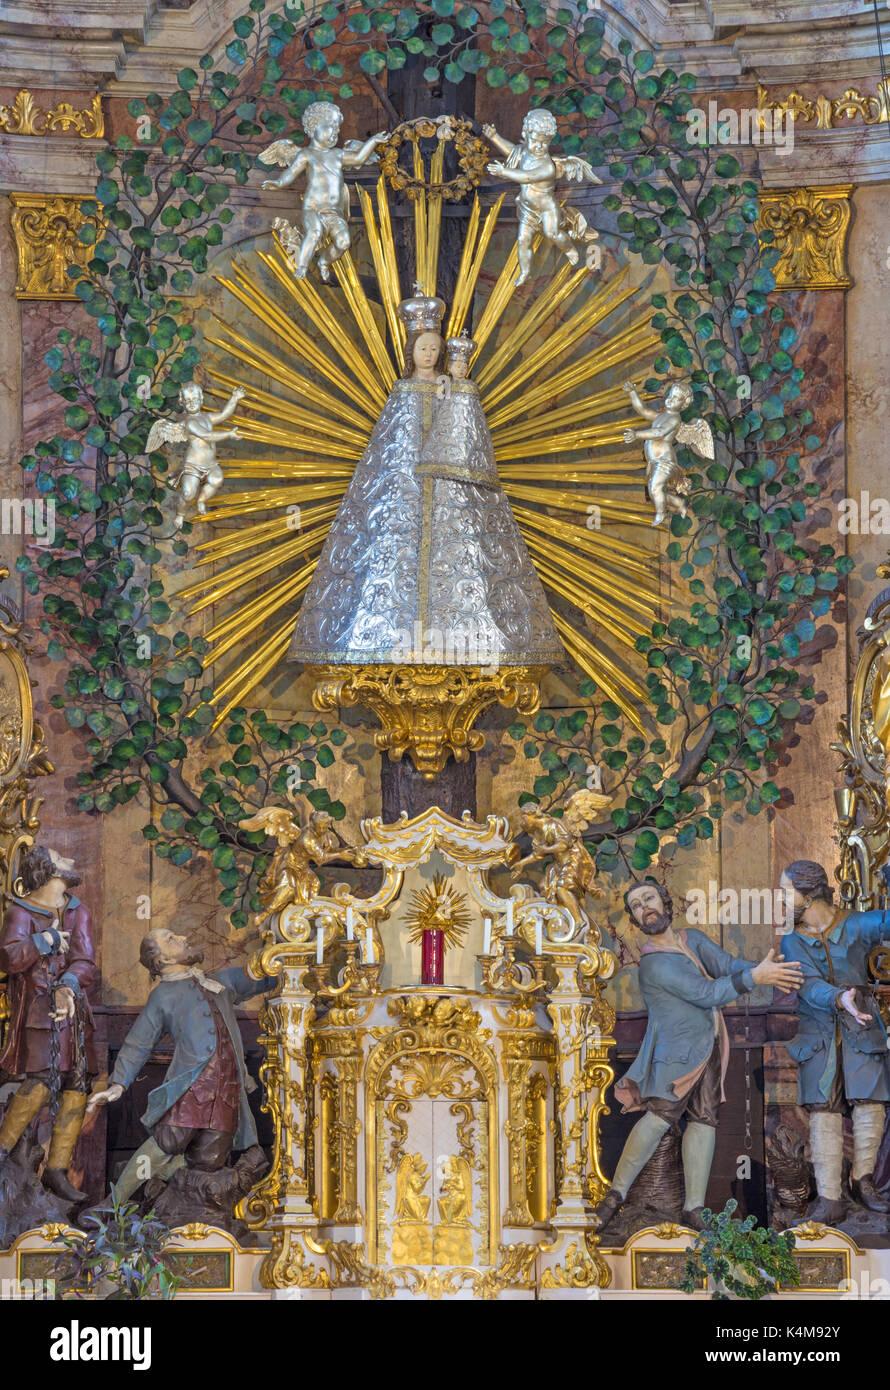 VIENNA, AUSTRIA - JULY 30, 2014: The central part main altar with statue of Madonna in church Pfarkirche Maria Hietzing by Matthias Steinl (1751). - Stock Image